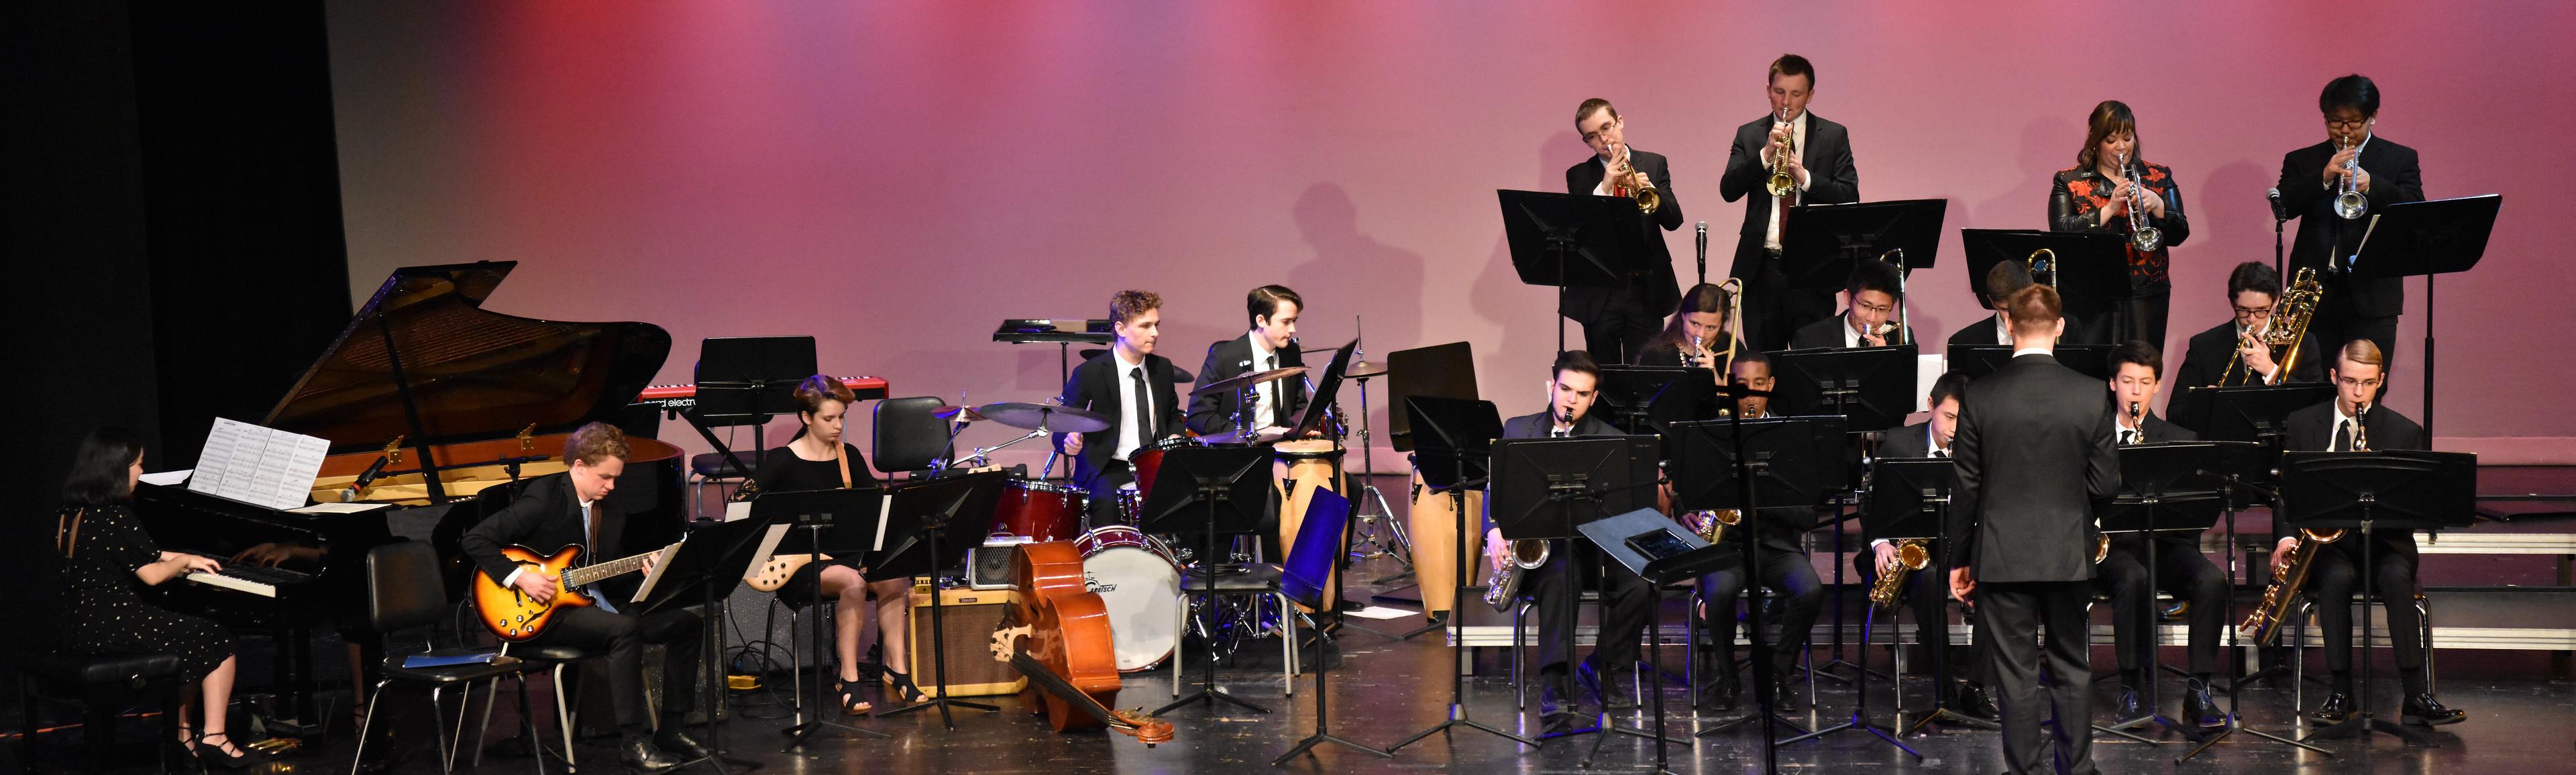 Conestoga High School Jazz Ensemble